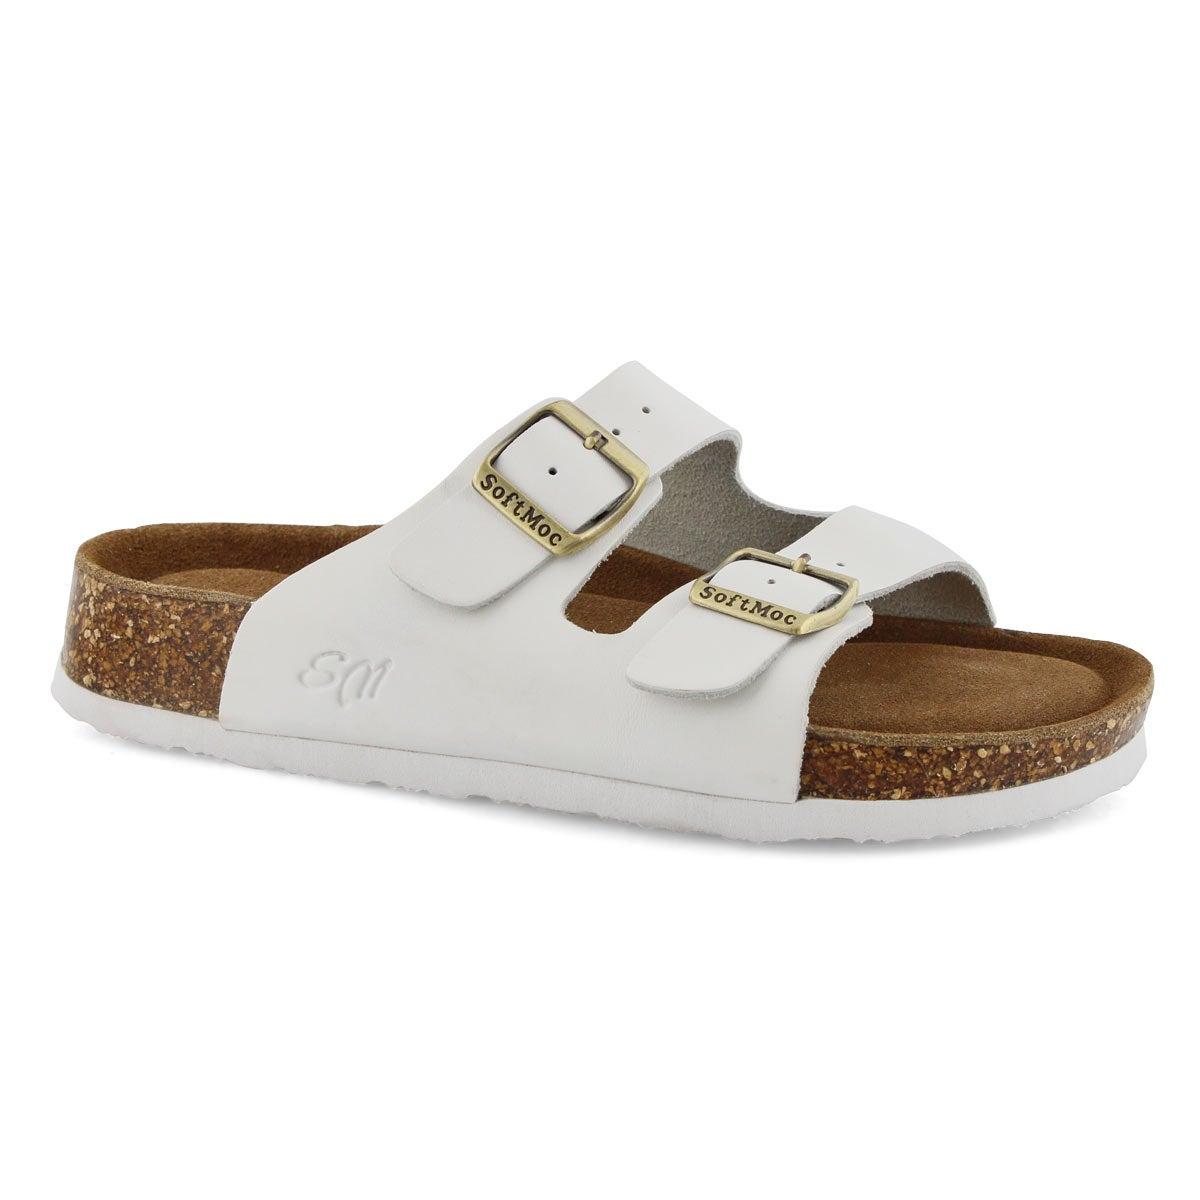 Women's ANNA 5 white memory foam sandals